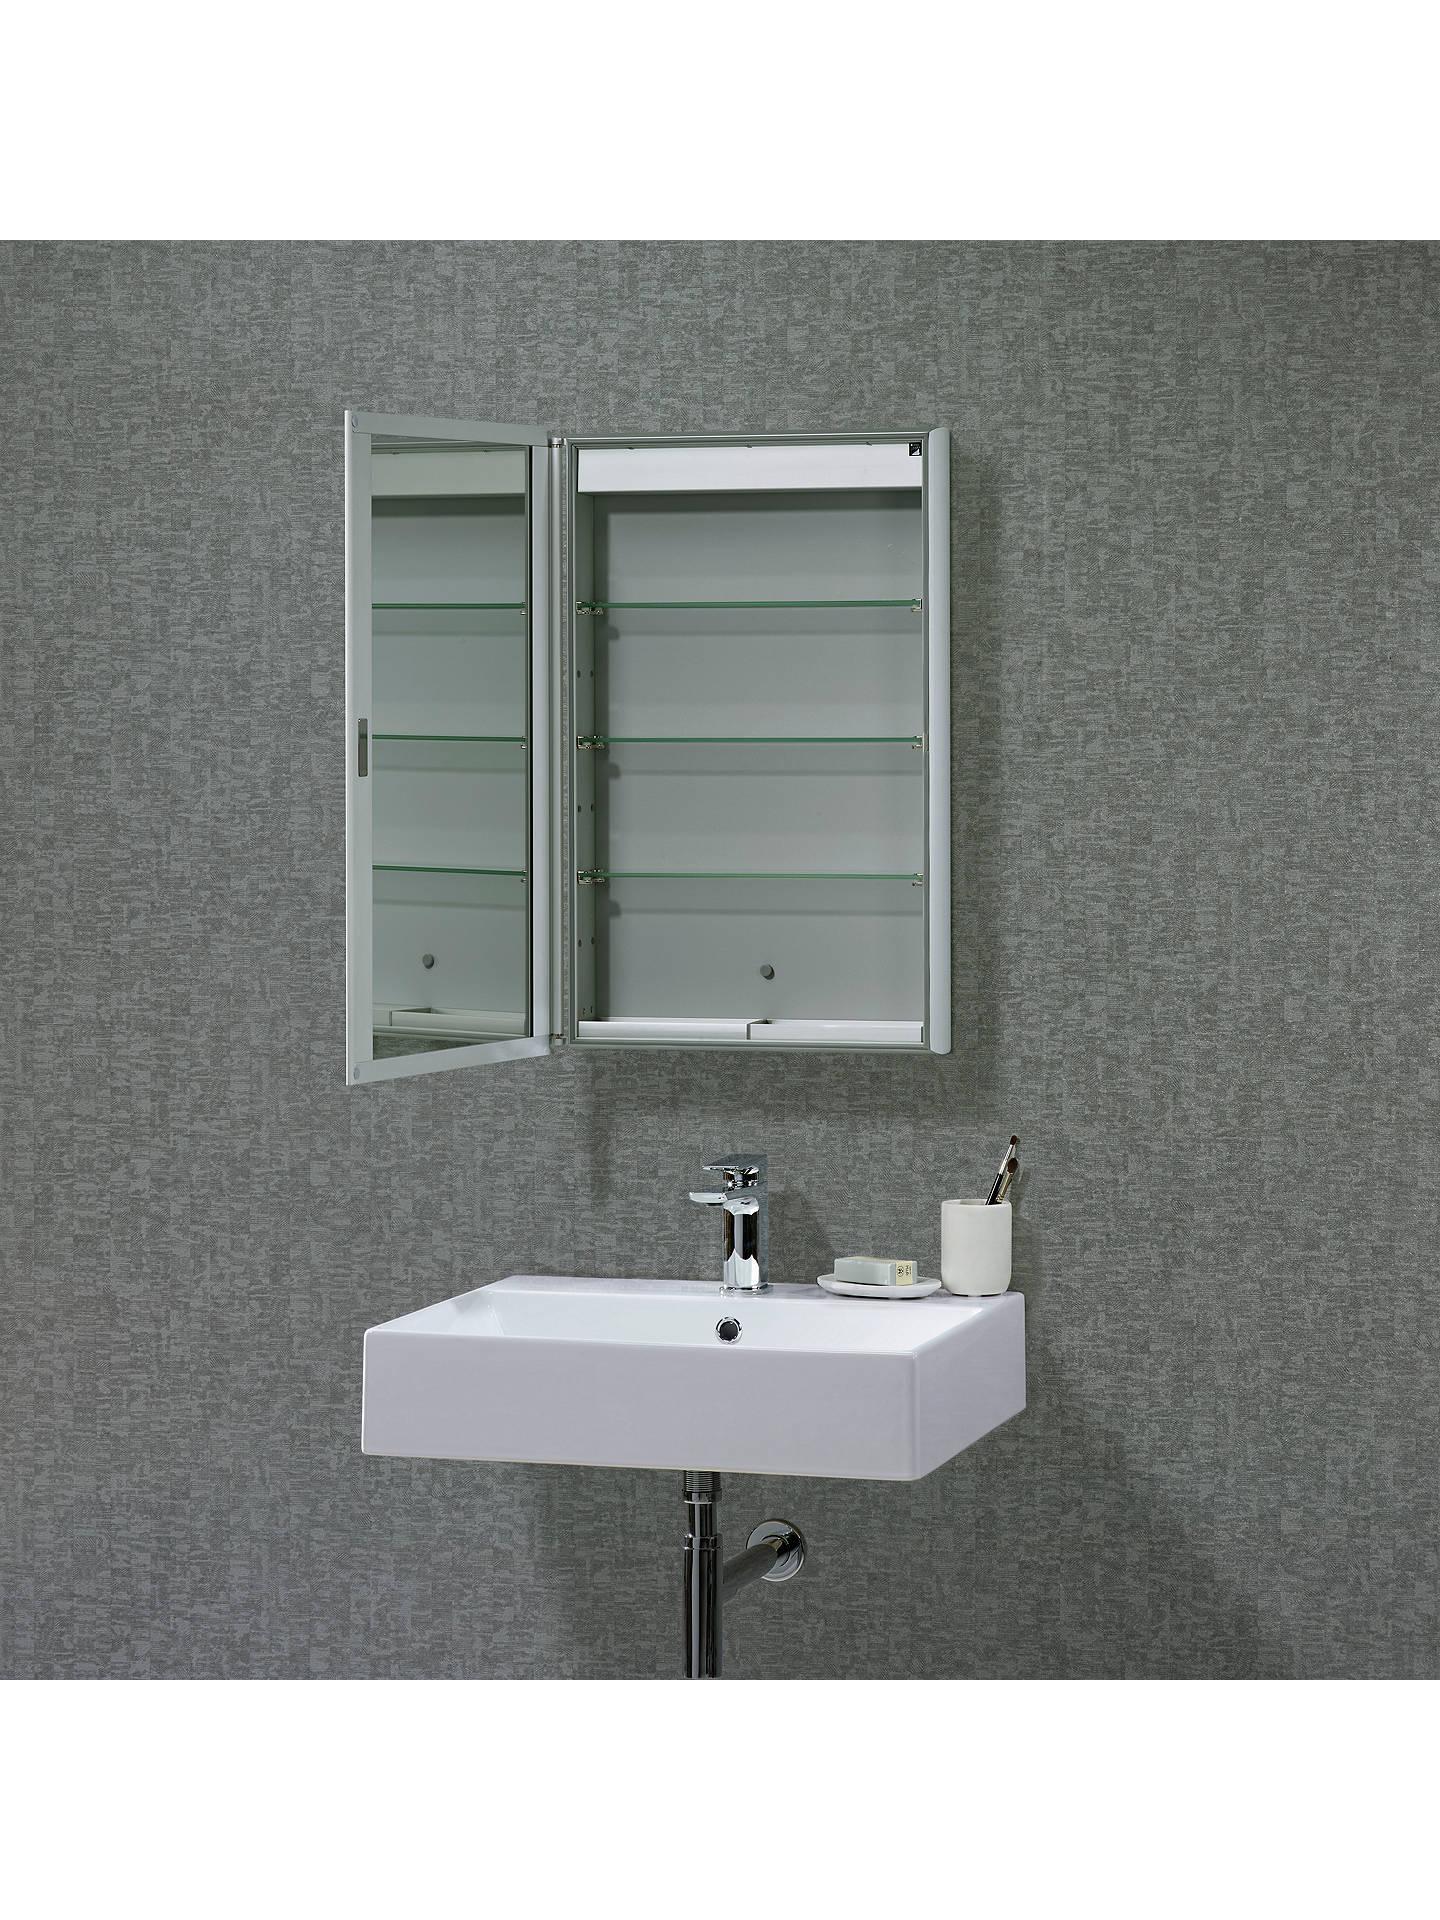 Roper Rhodes Limit Slimline Single Mirrored Bathroom Cabinet At John Lewis Partners